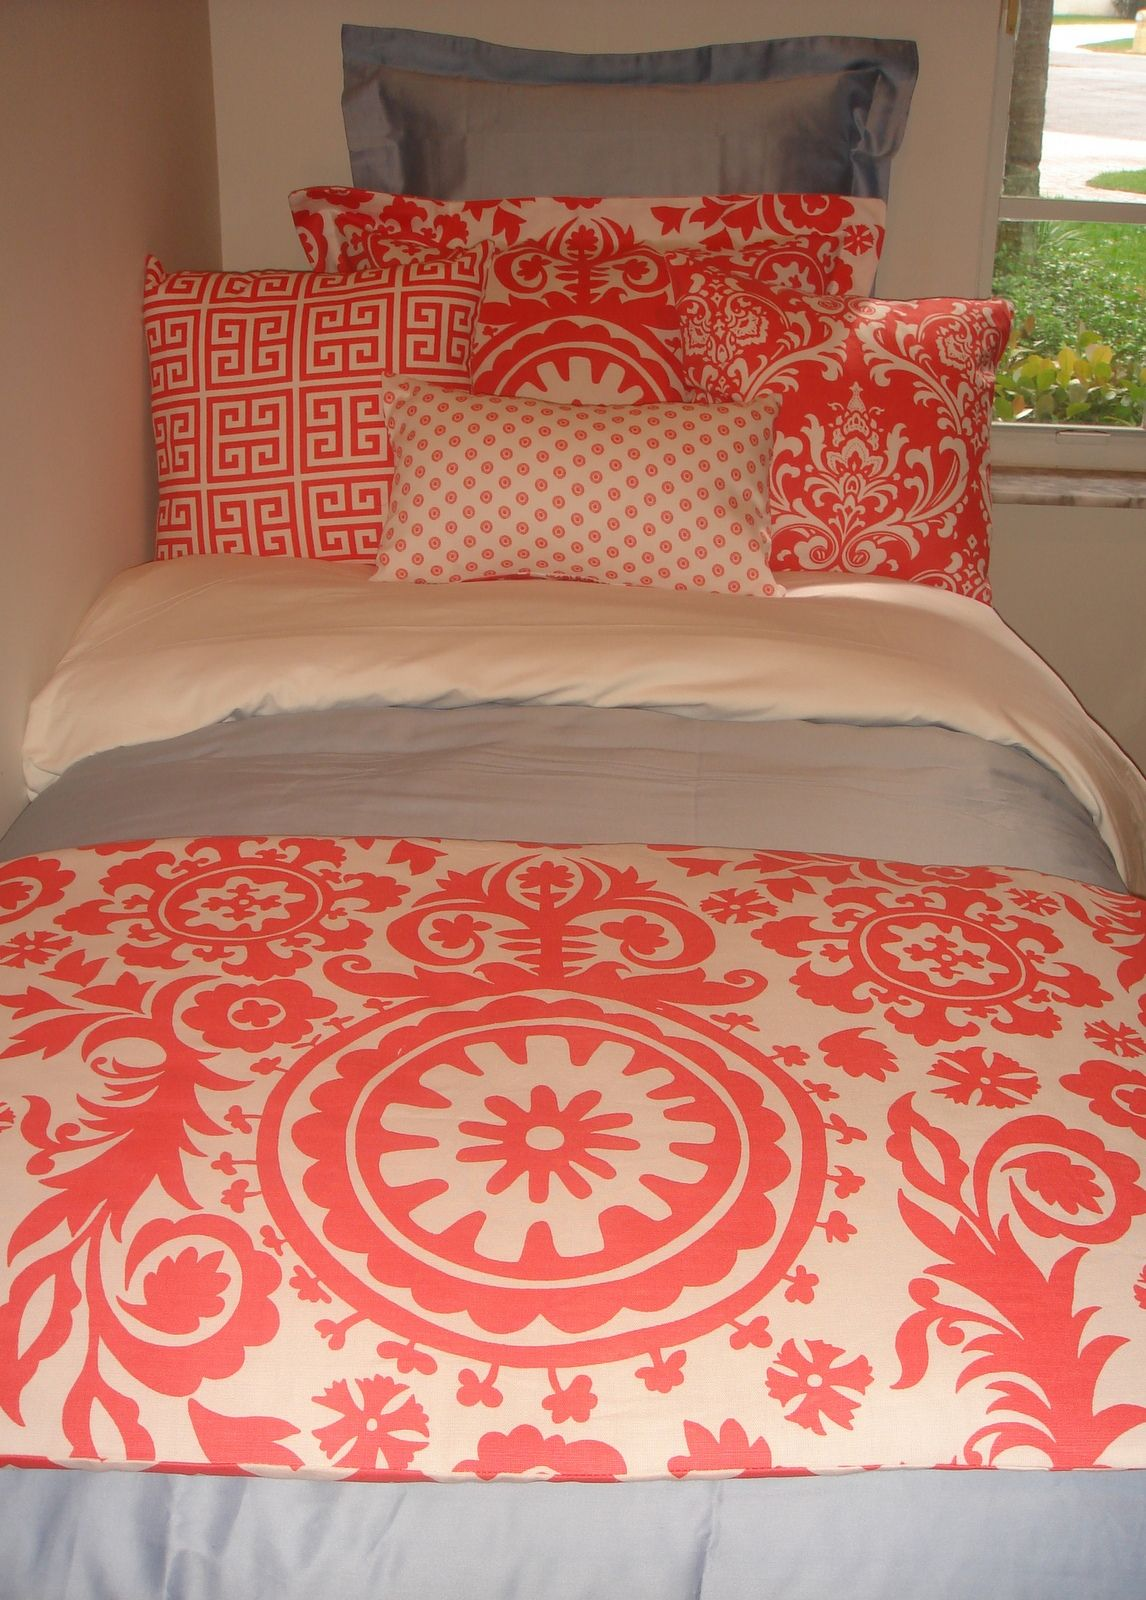 Preppy Gray Dorm Room Bedding | Dorm bedding sets, Dorm ...